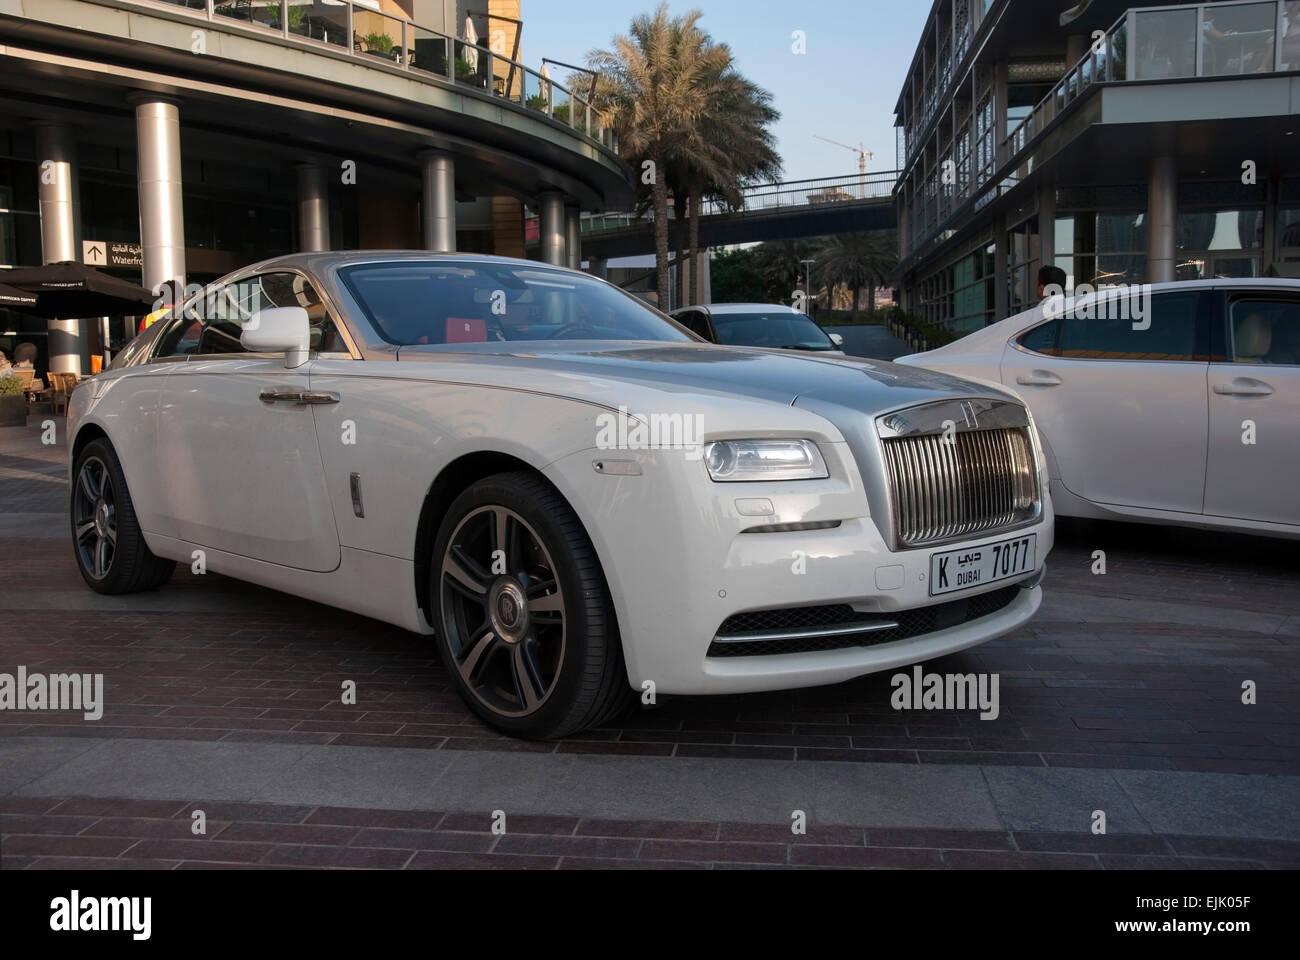 White Chrome Rolls Royce Wraith Coupe Motor Car Stock Photo Alamy